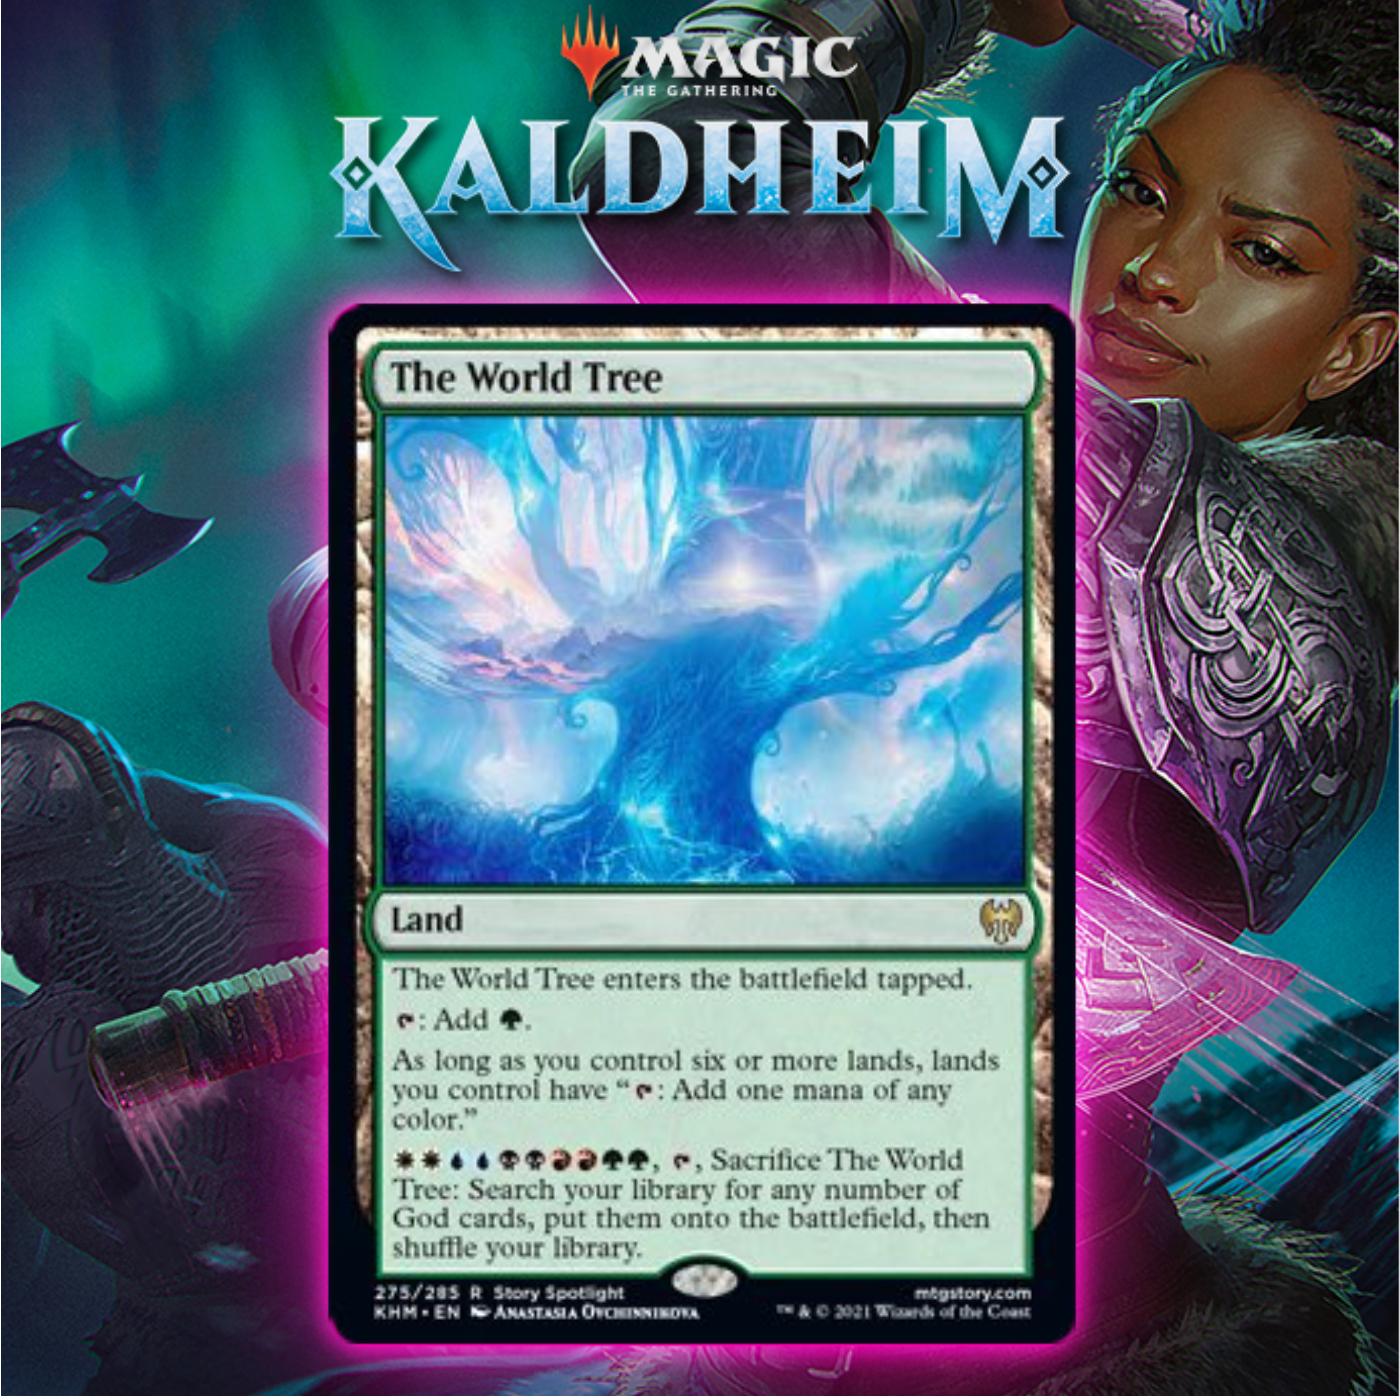 Kaldheim Introduces The World Tree